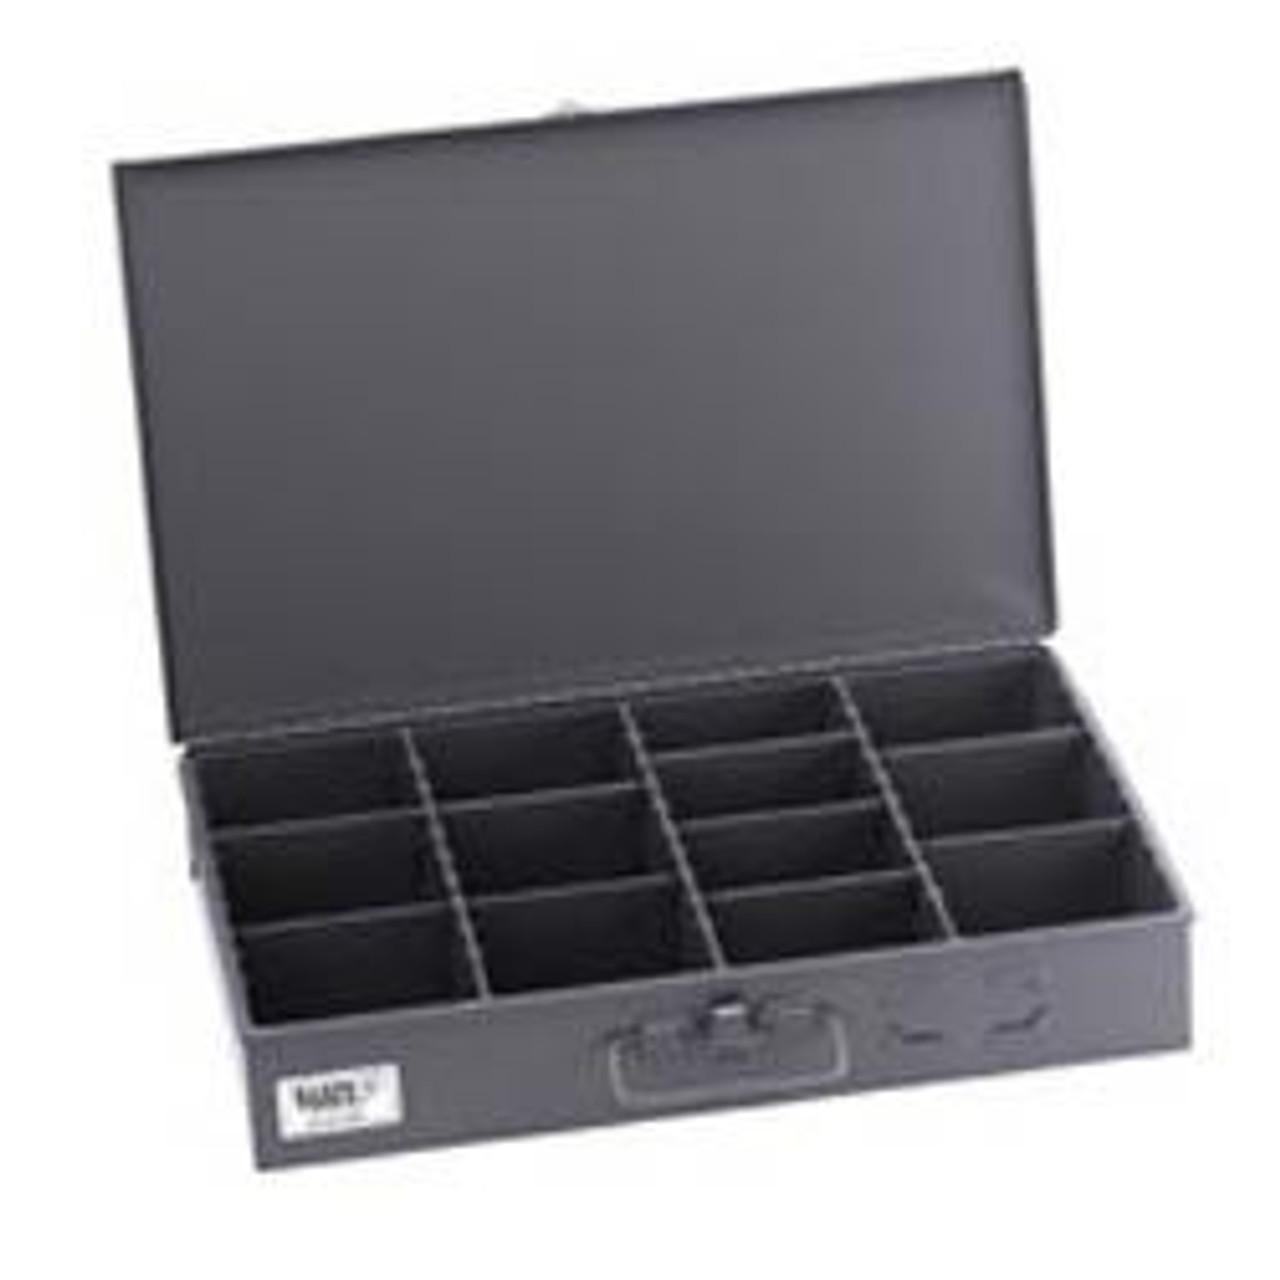 Klein 54451 Adjustable-Compartment Parts Box